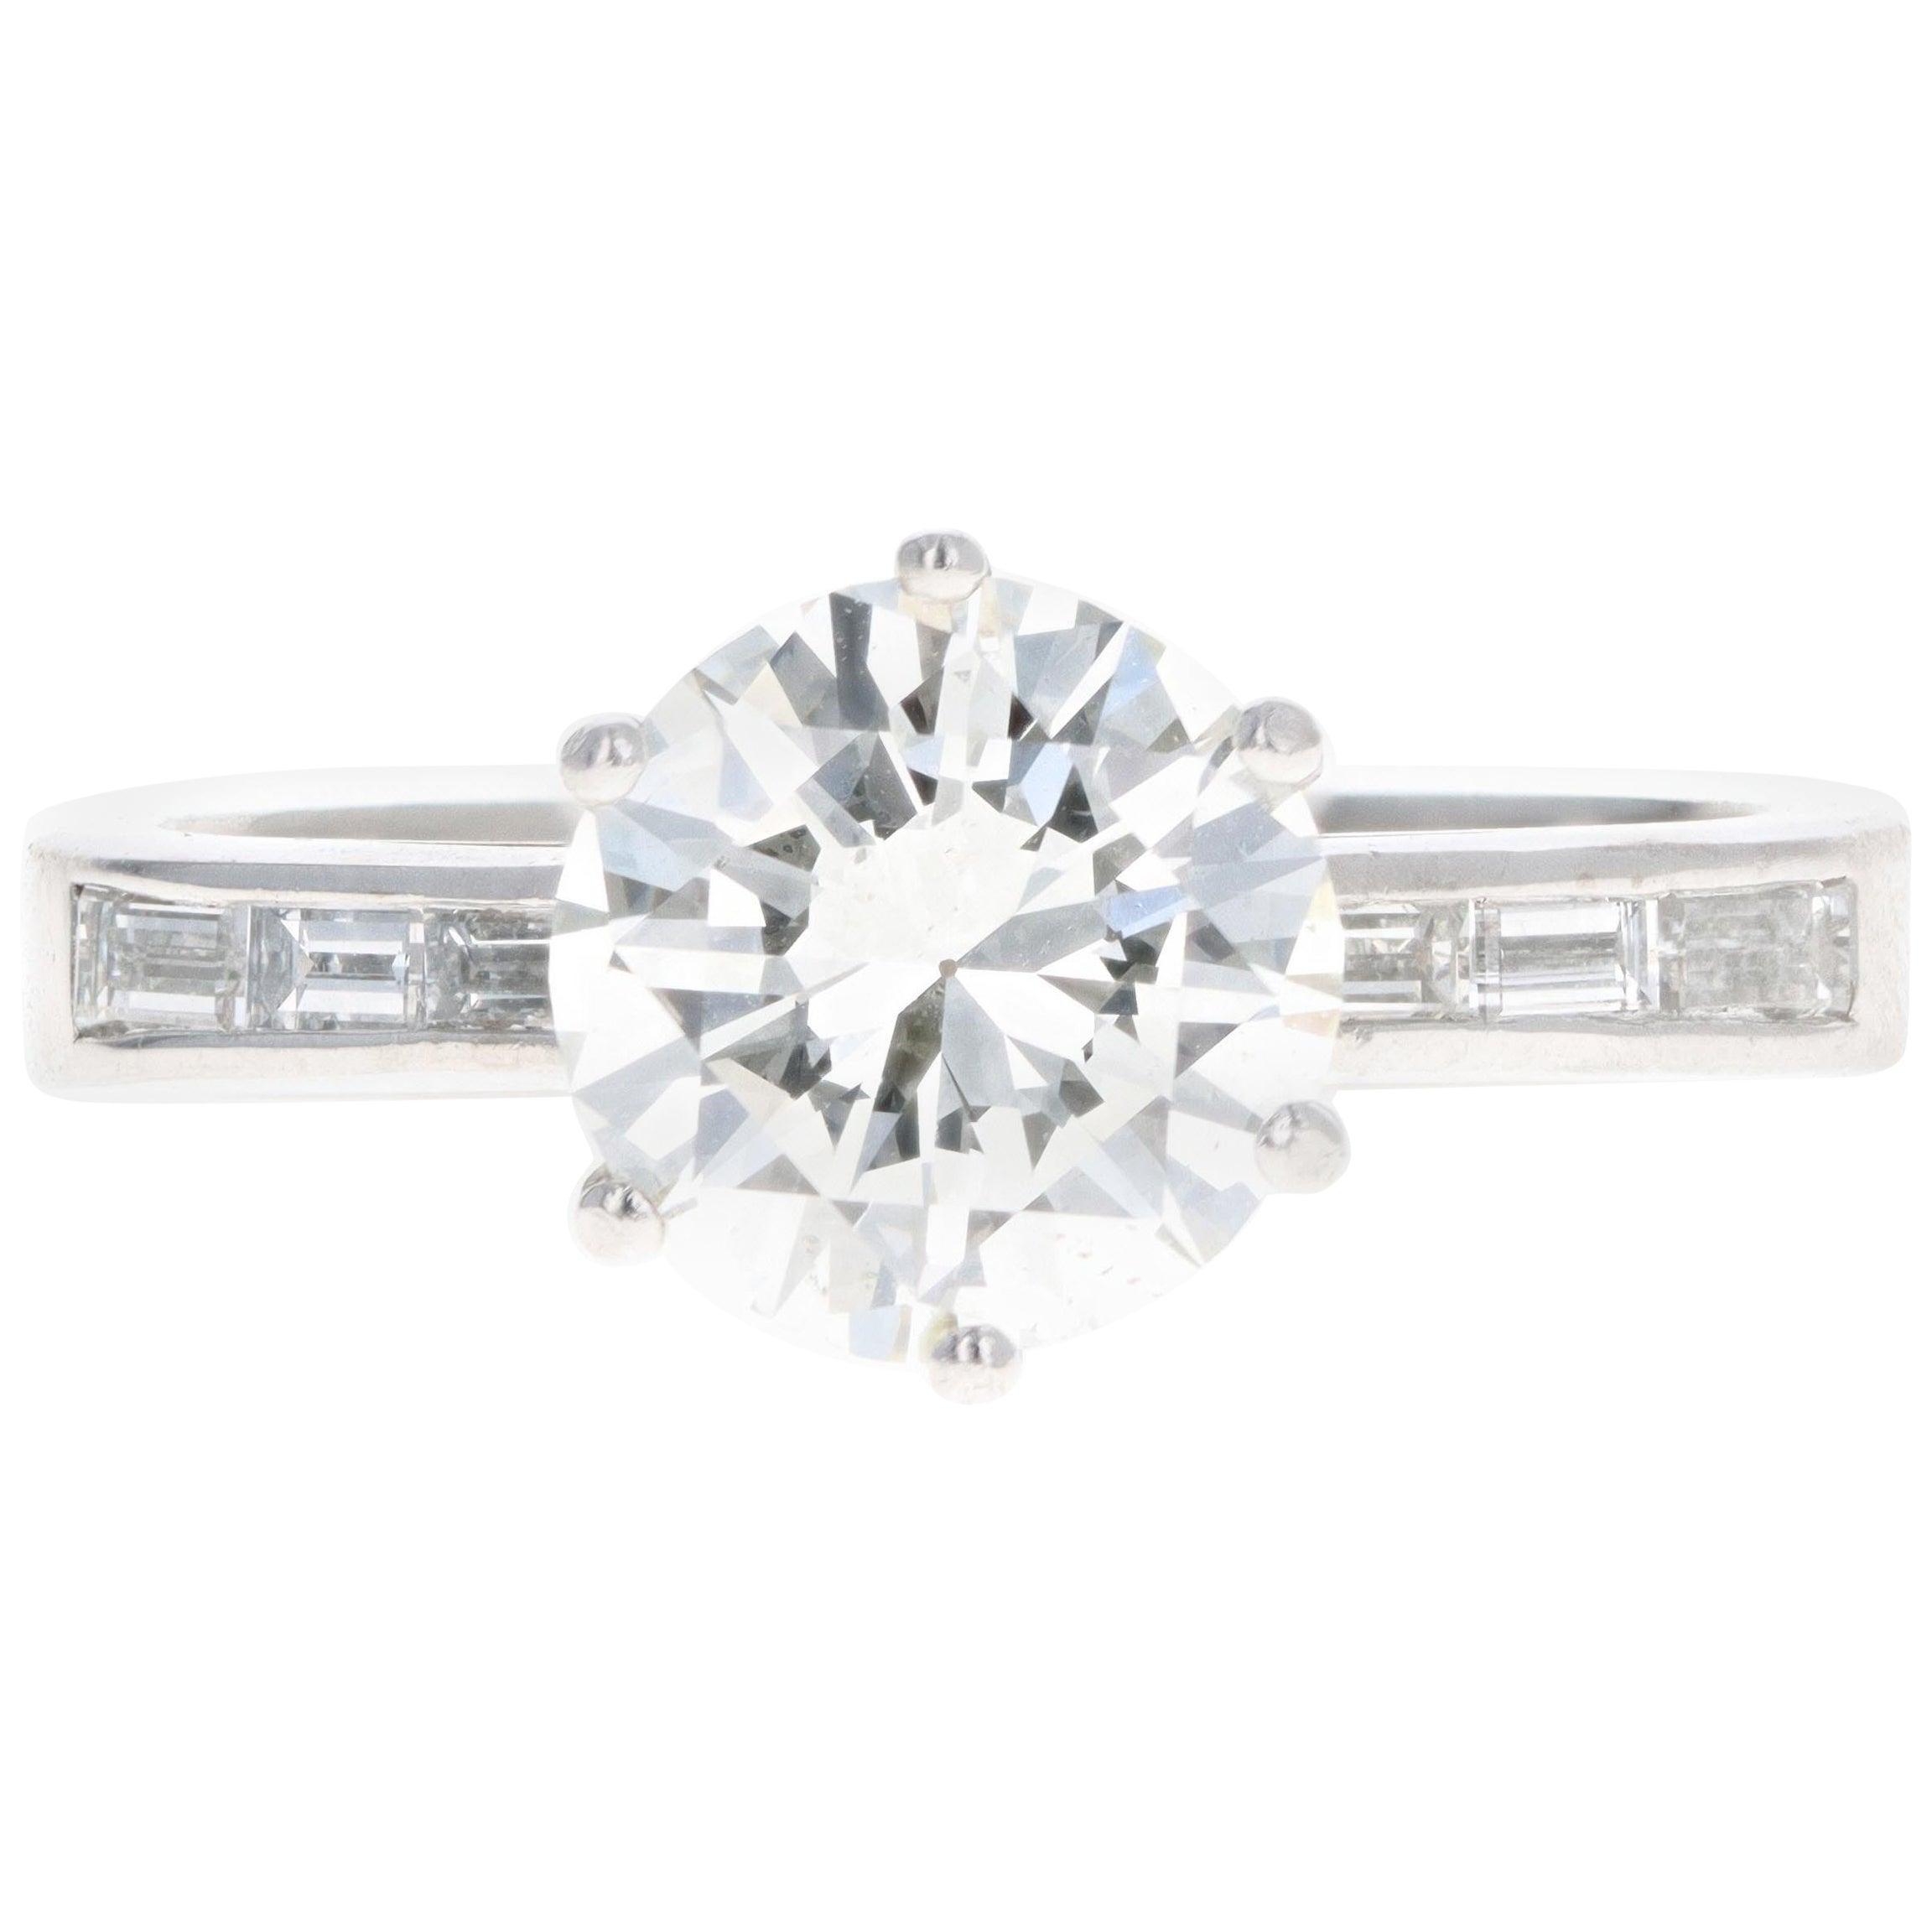 18K White Gold 1.85 Carat Round Brilliant Diamond Engagement Ring